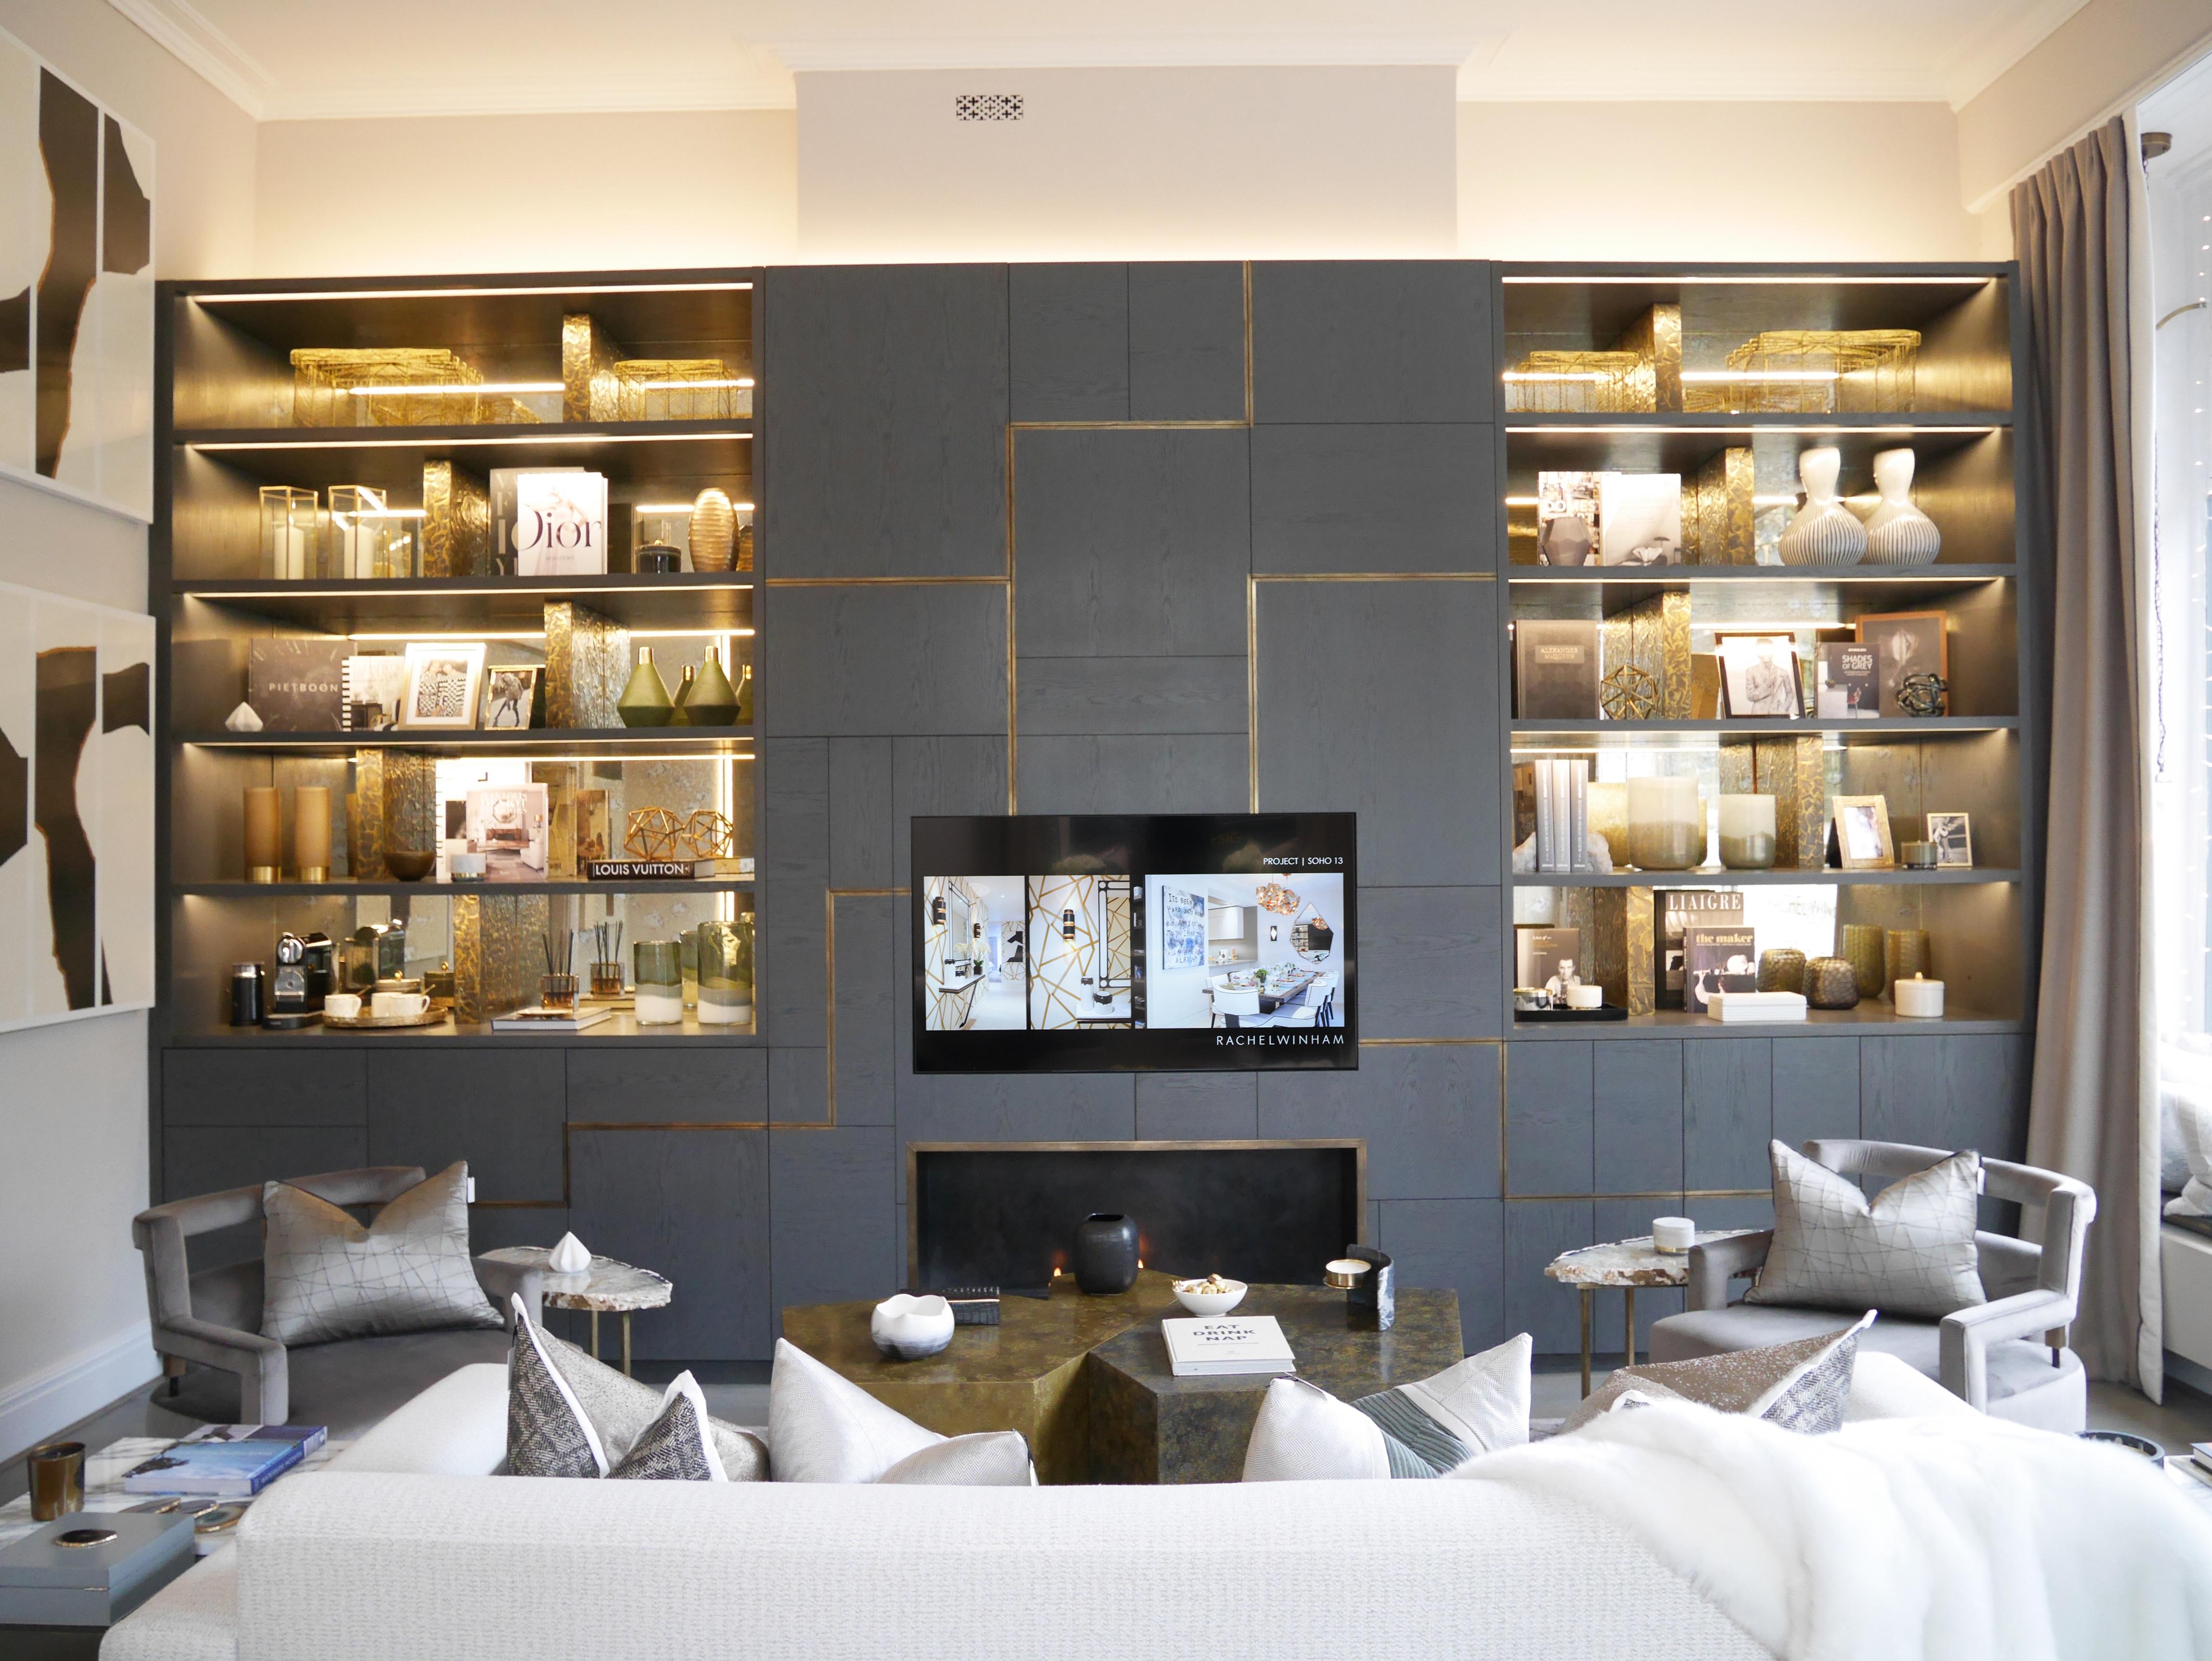 Rachel Winham Interior Design - Bespoke Cabinetry